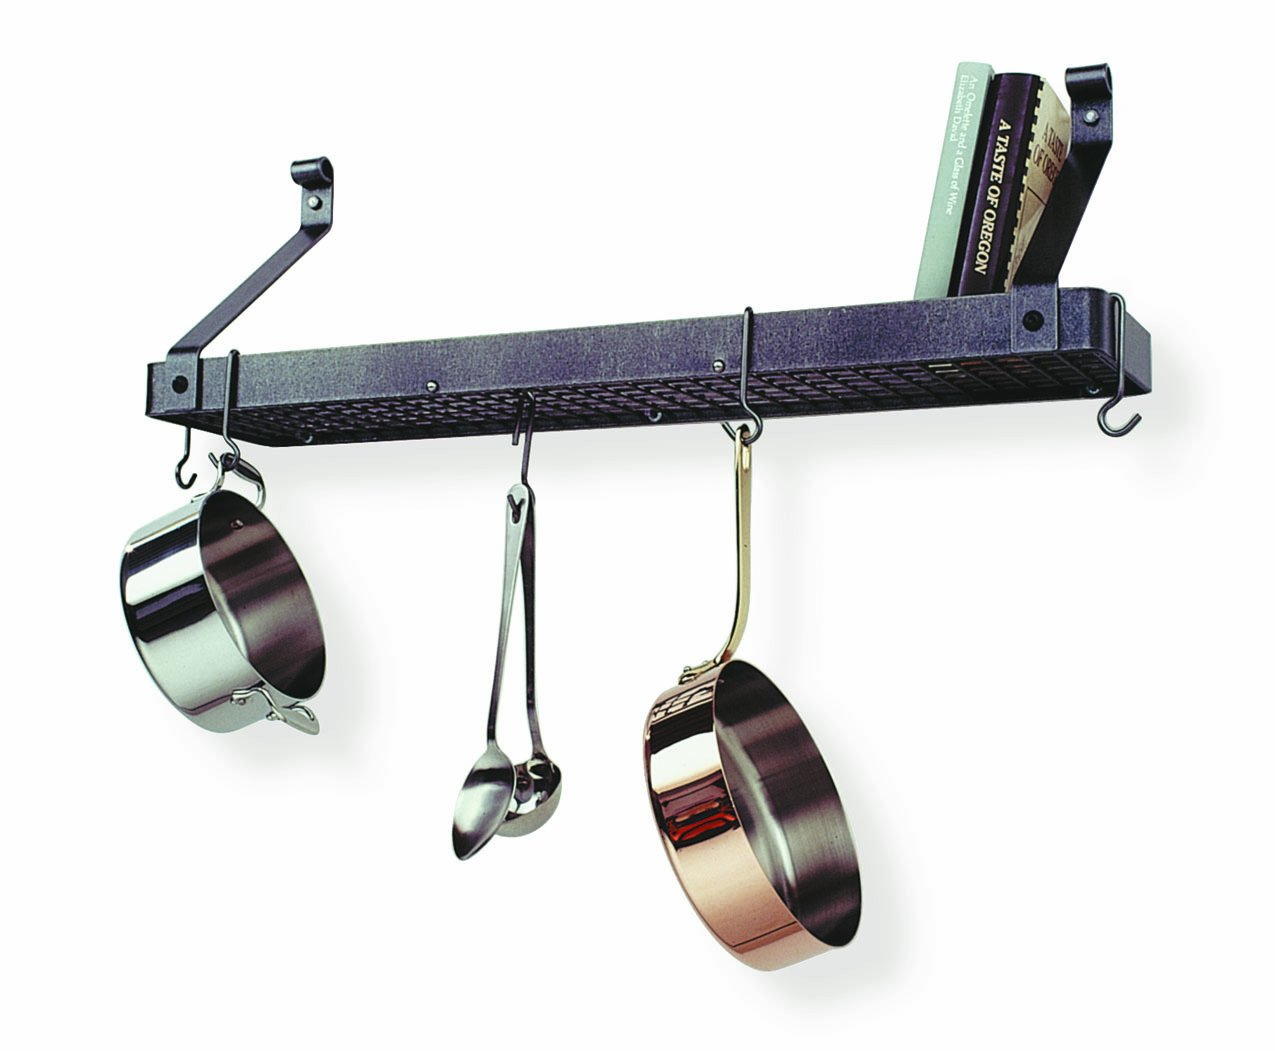 mount chain wall bookshelf on best hooks pot shelf racks hang decoration and to rack uk ceiling enclume kitchen pots with potrack pan island decorative